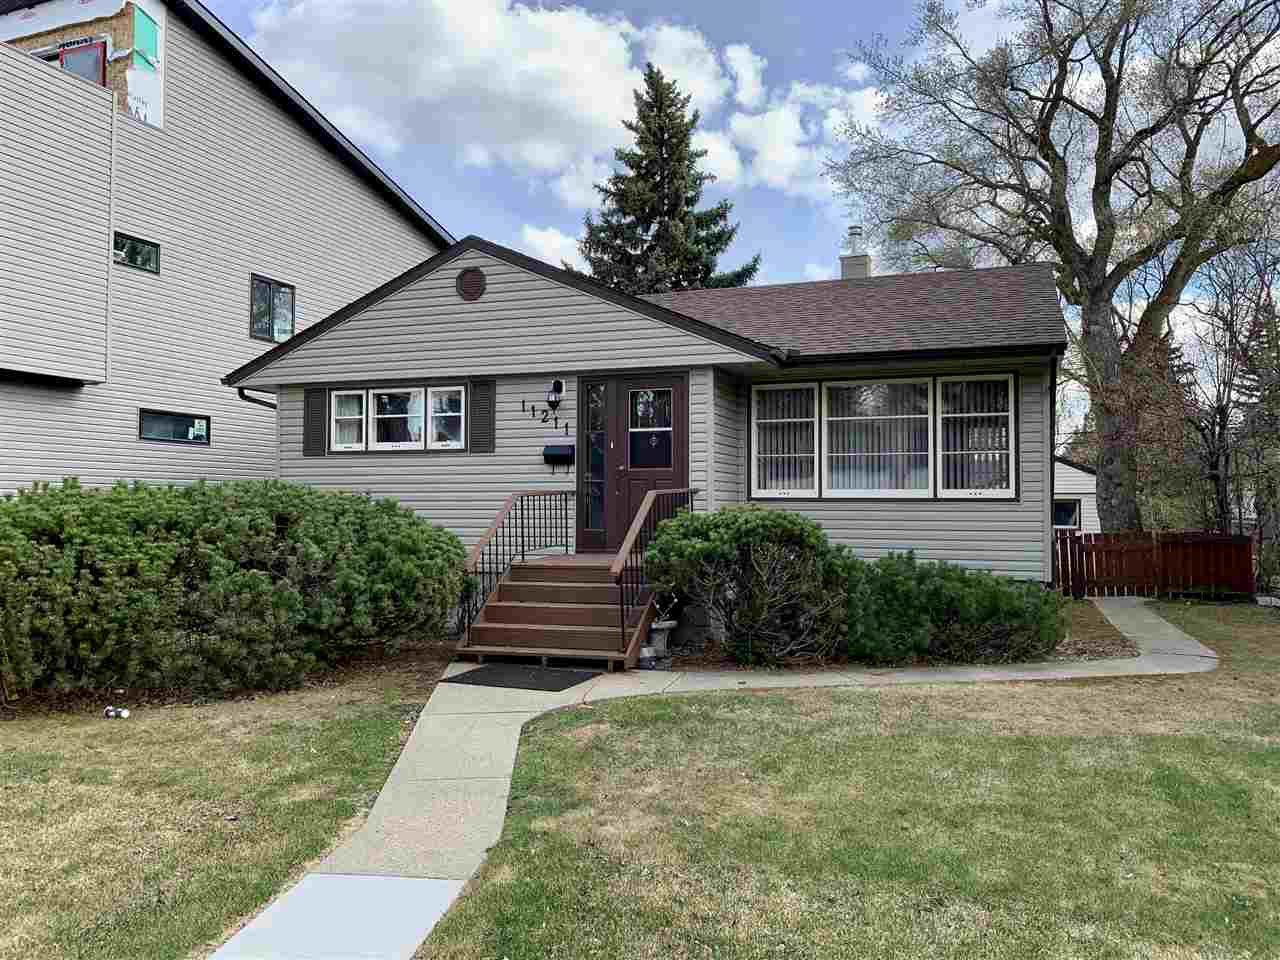 Main Photo: 11211 75 Avenue in Edmonton: Zone 15 House for sale : MLS®# E4192495